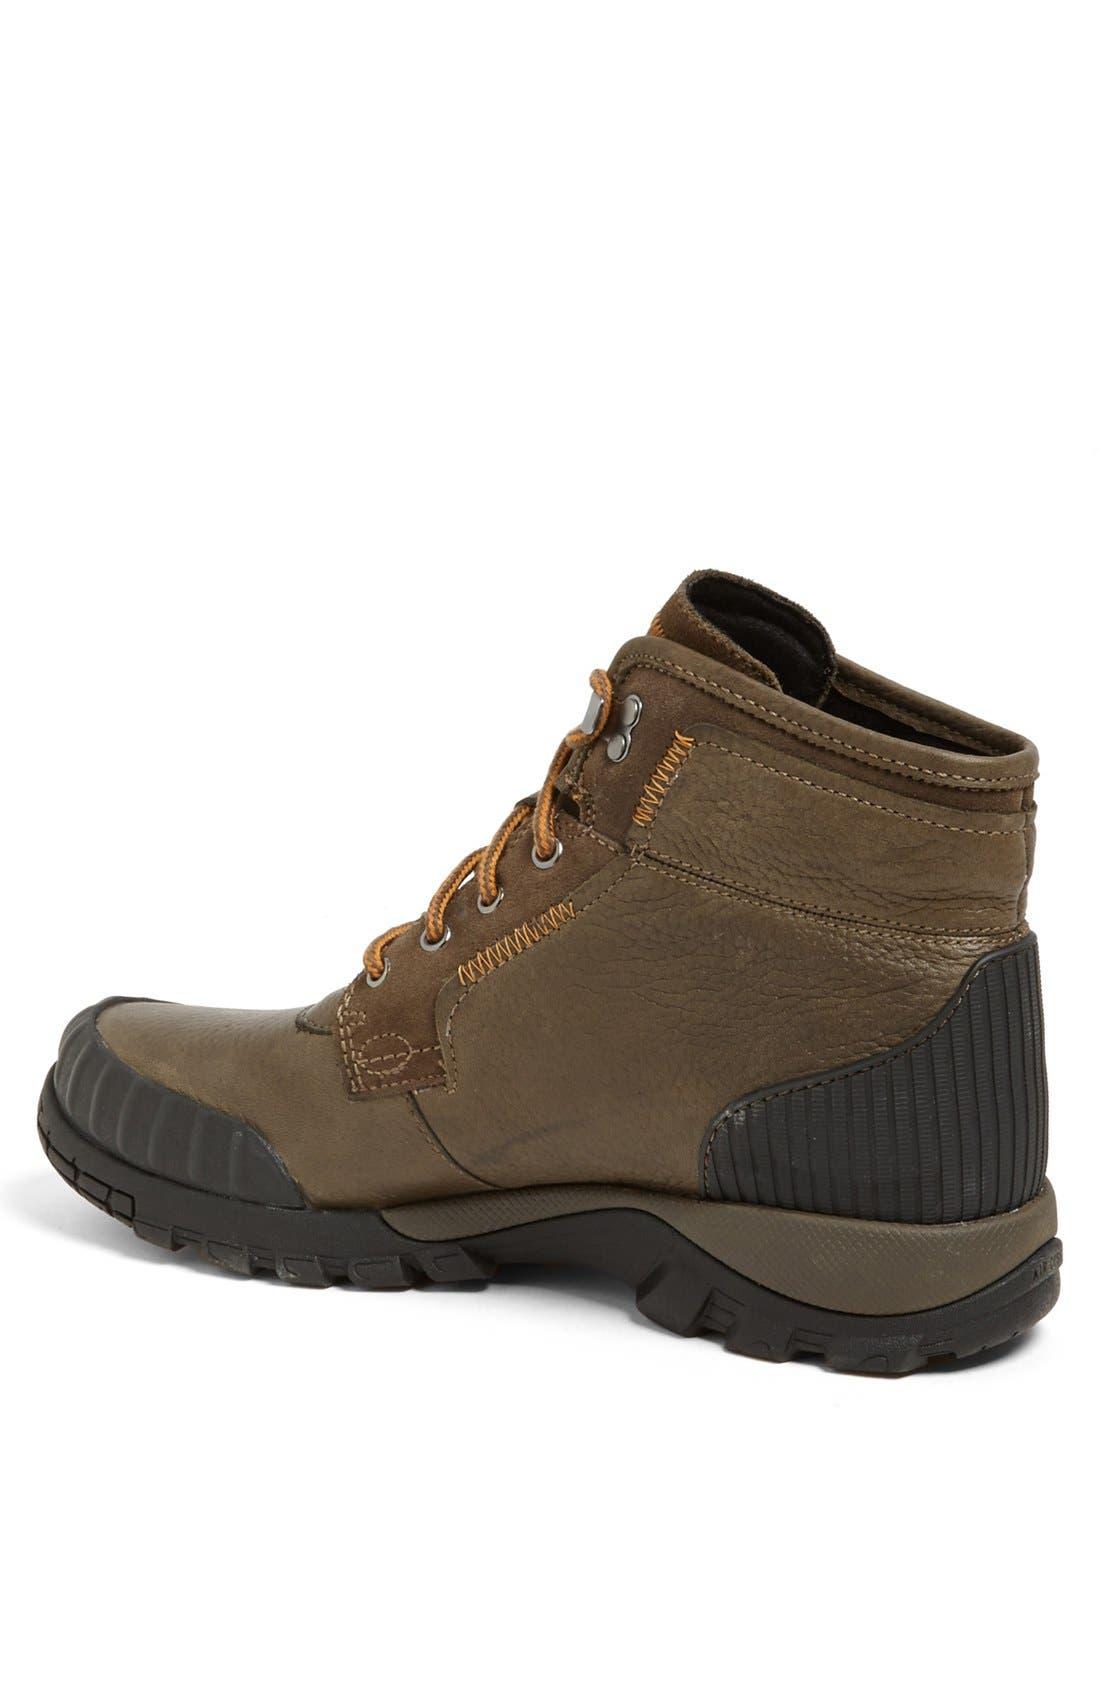 Alternate Image 2  - Merrell 'Himavat' Waterproof Chukka Boot